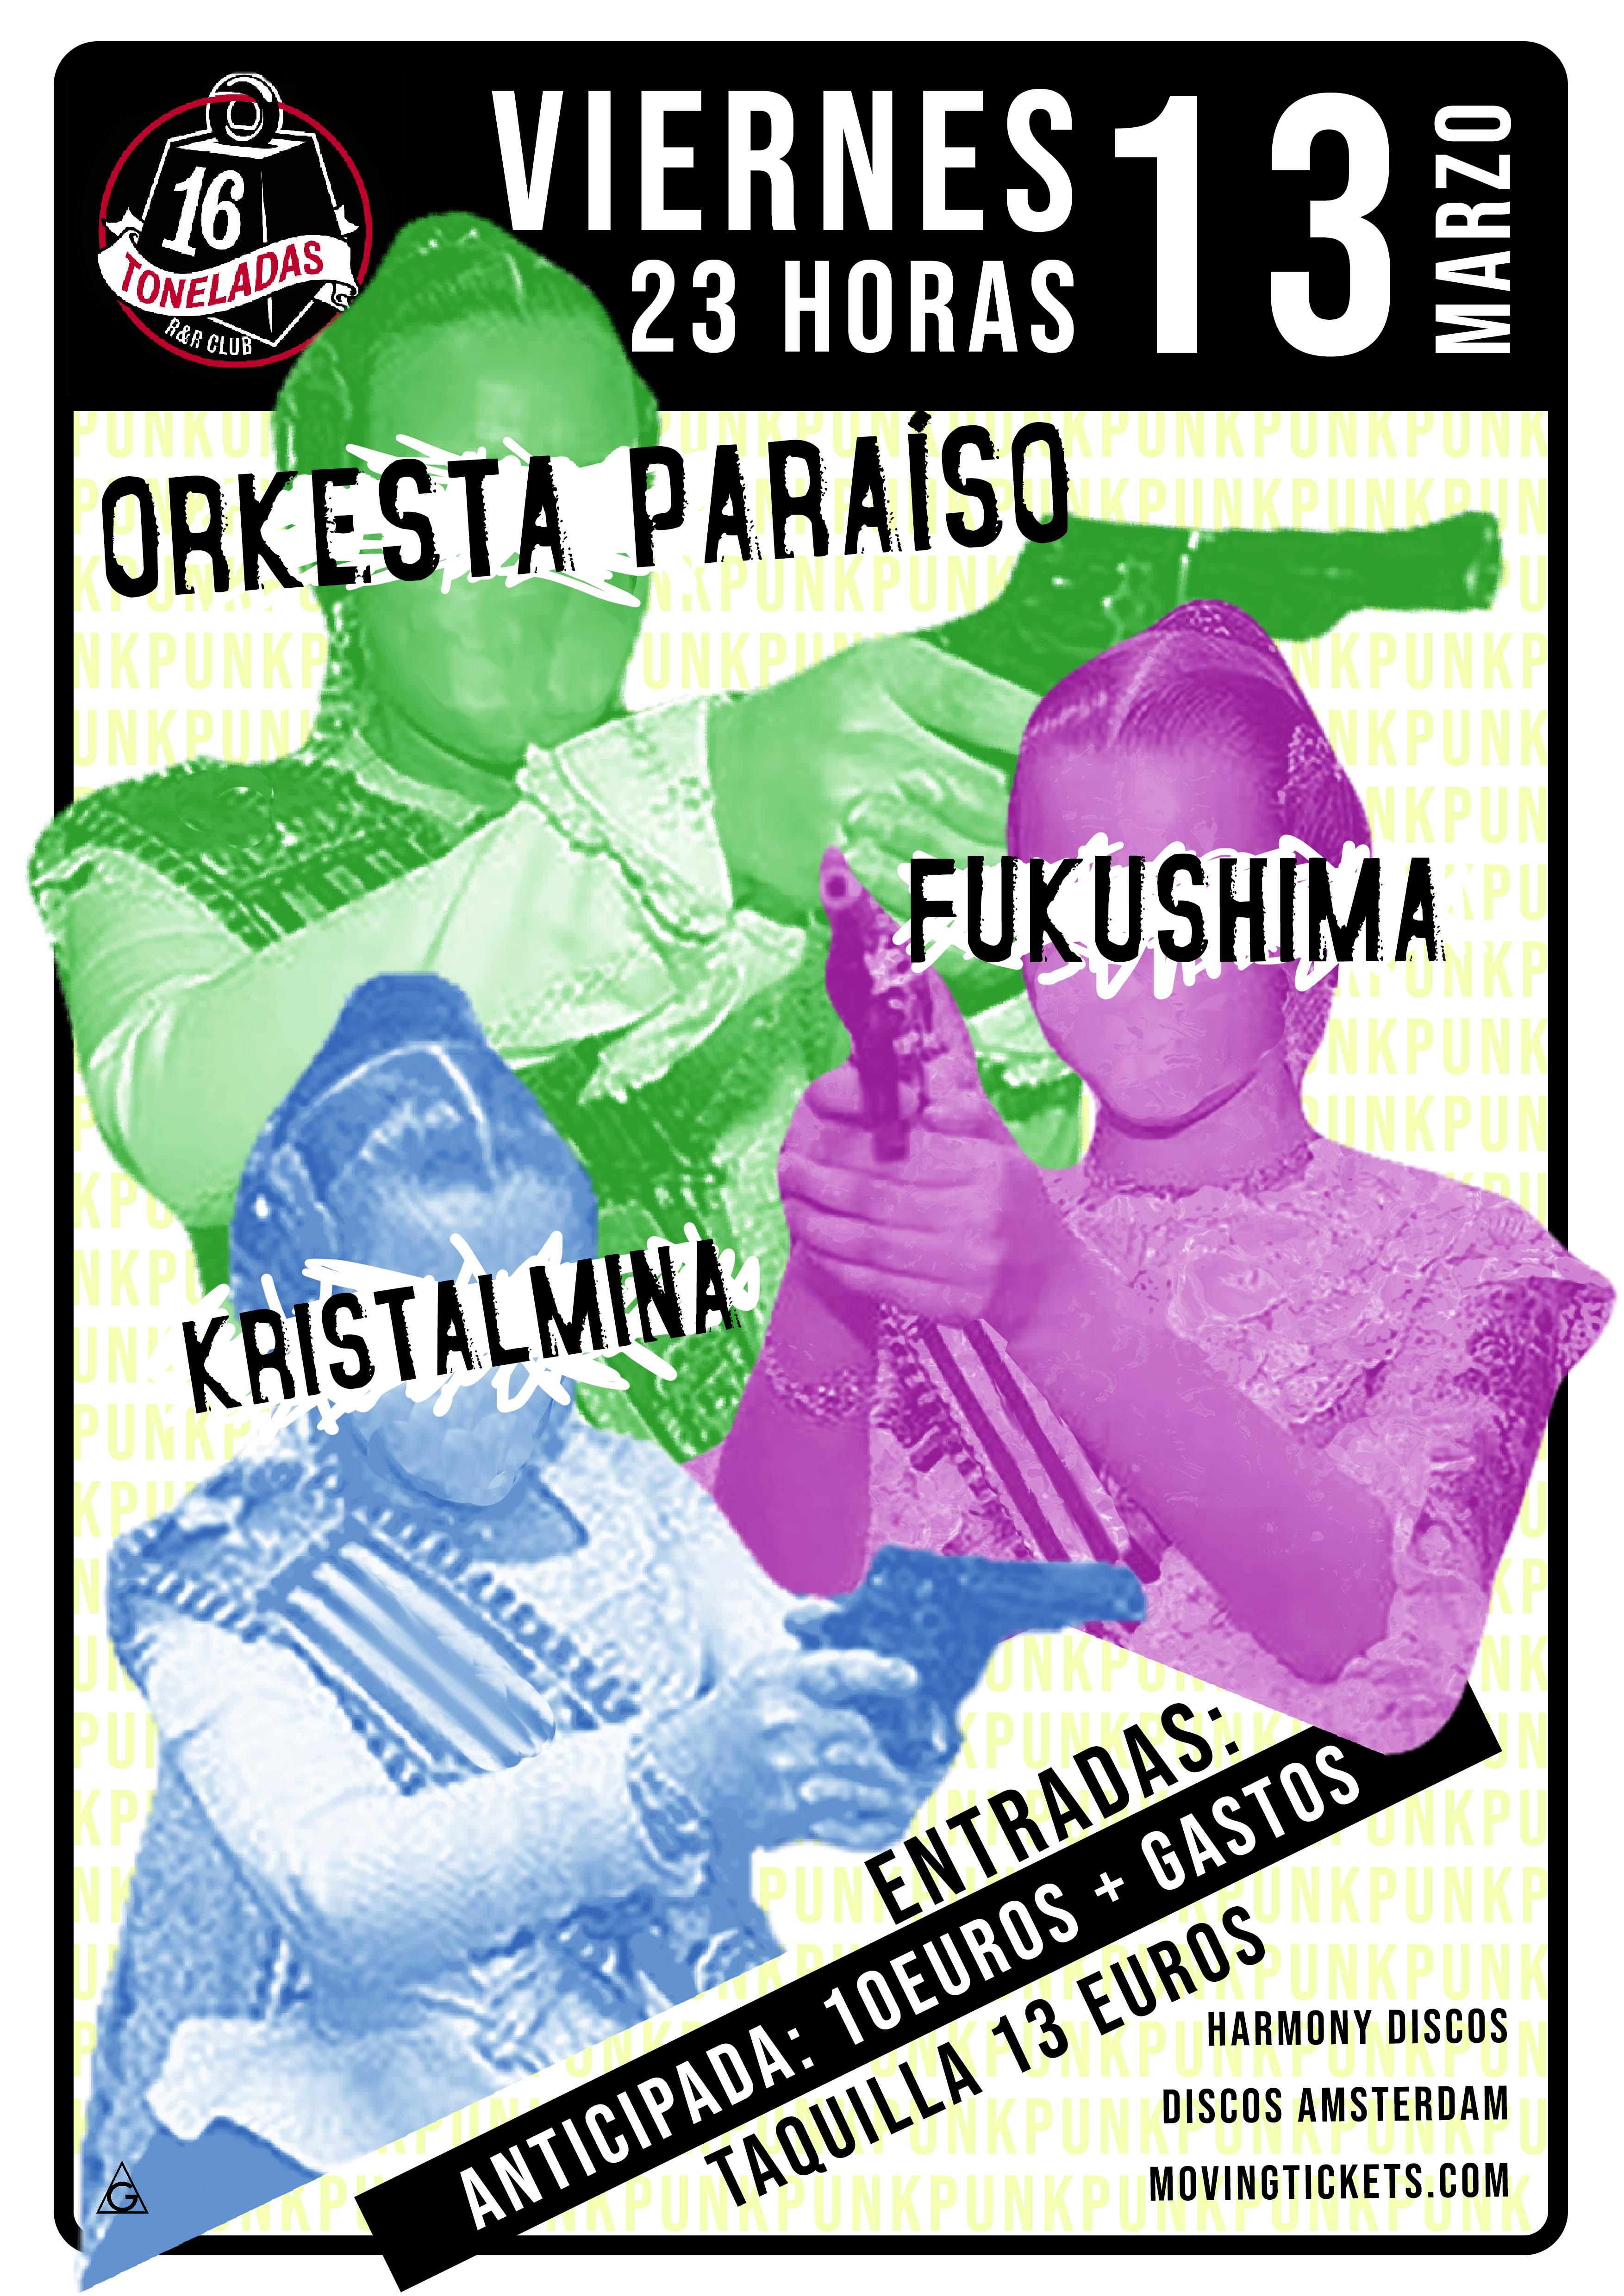 13-v-orkesta-paraiso